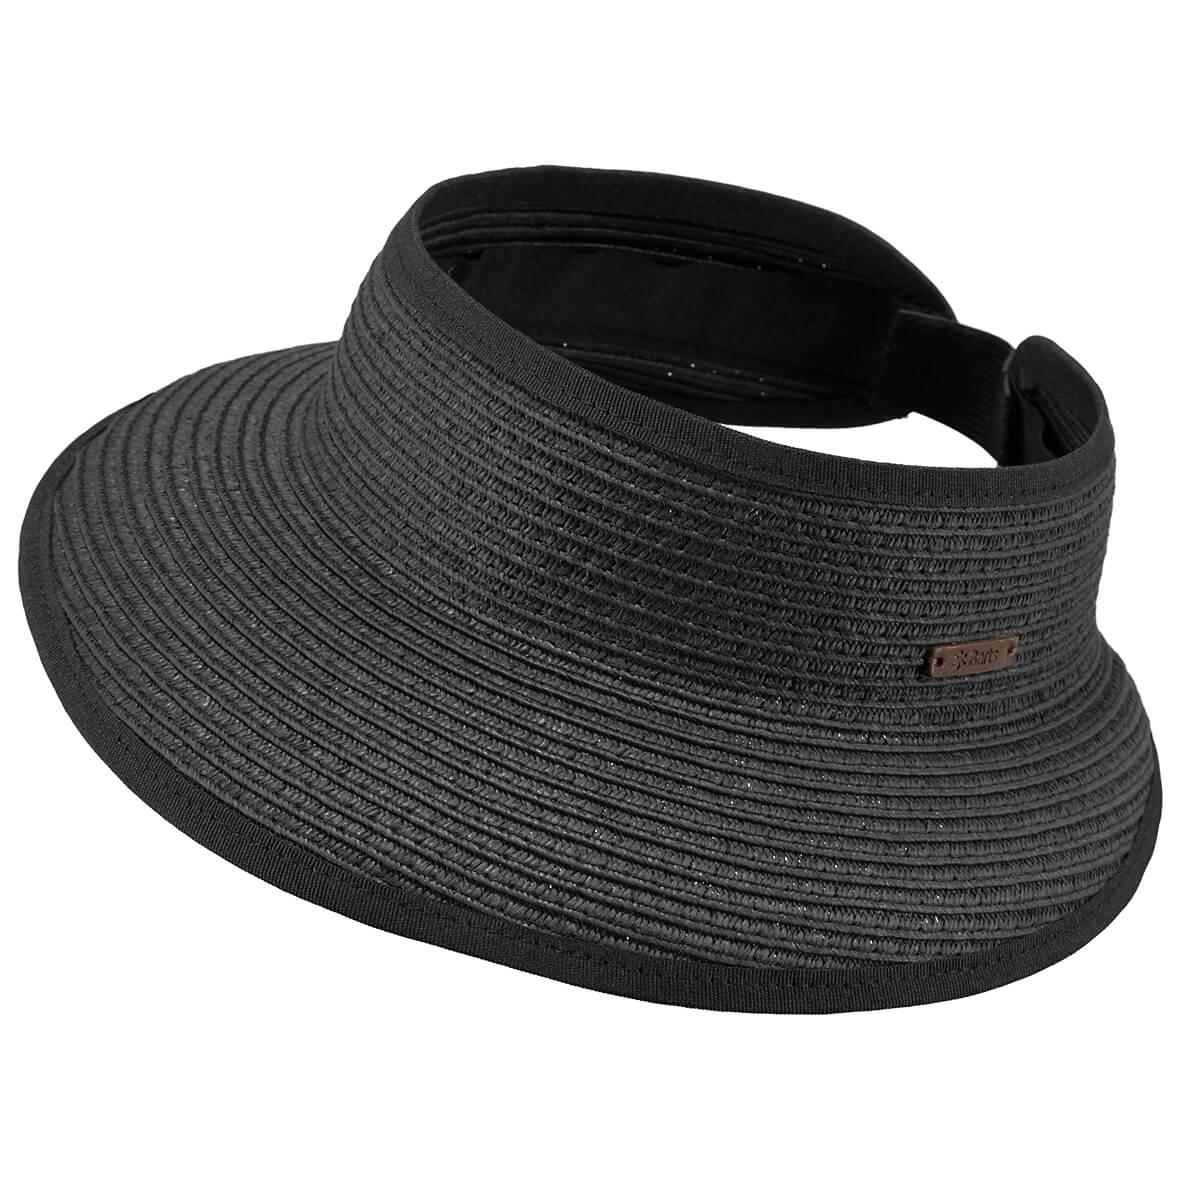 87ab56f9610 Barts Prim Visor - Hat Women s